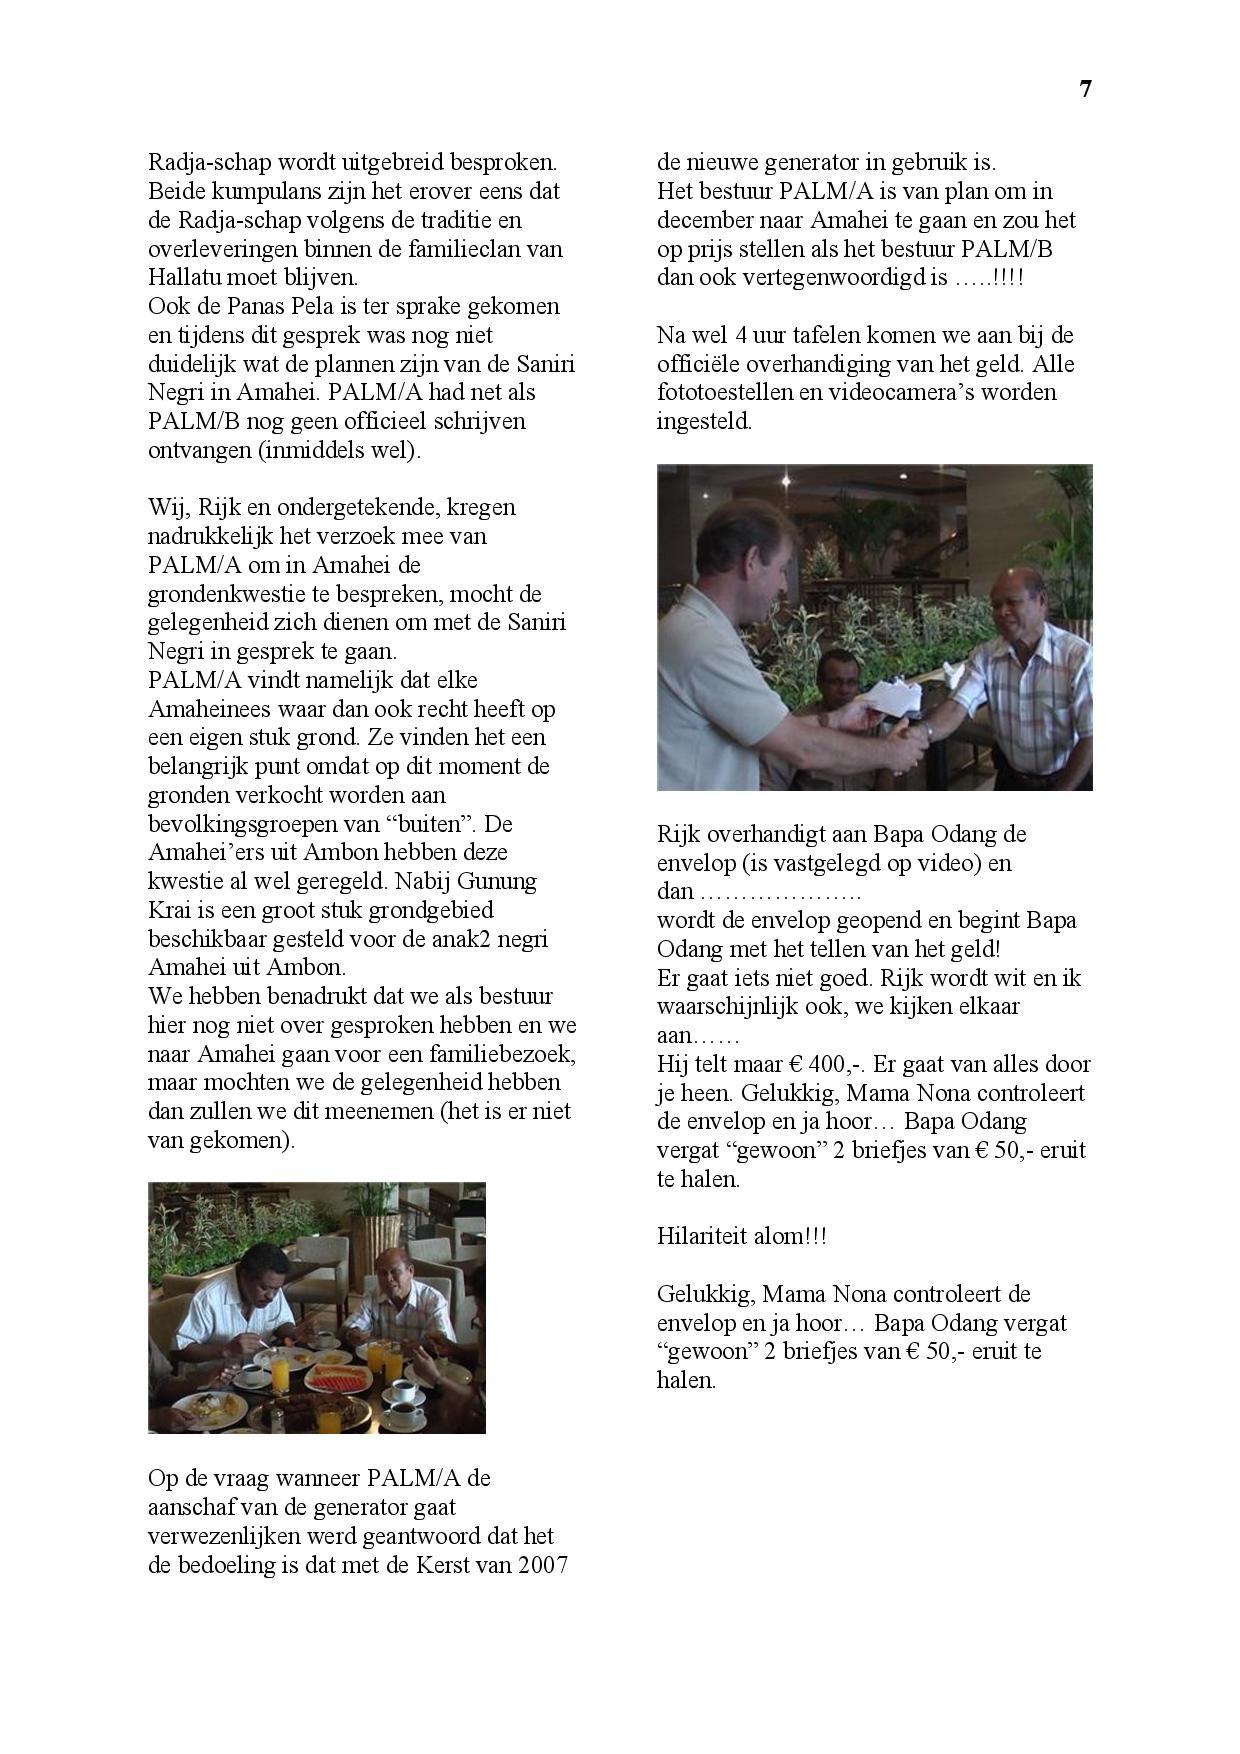 Saka Mese 3e jaargang nr. 02-2007 definitieve webversie-page-007